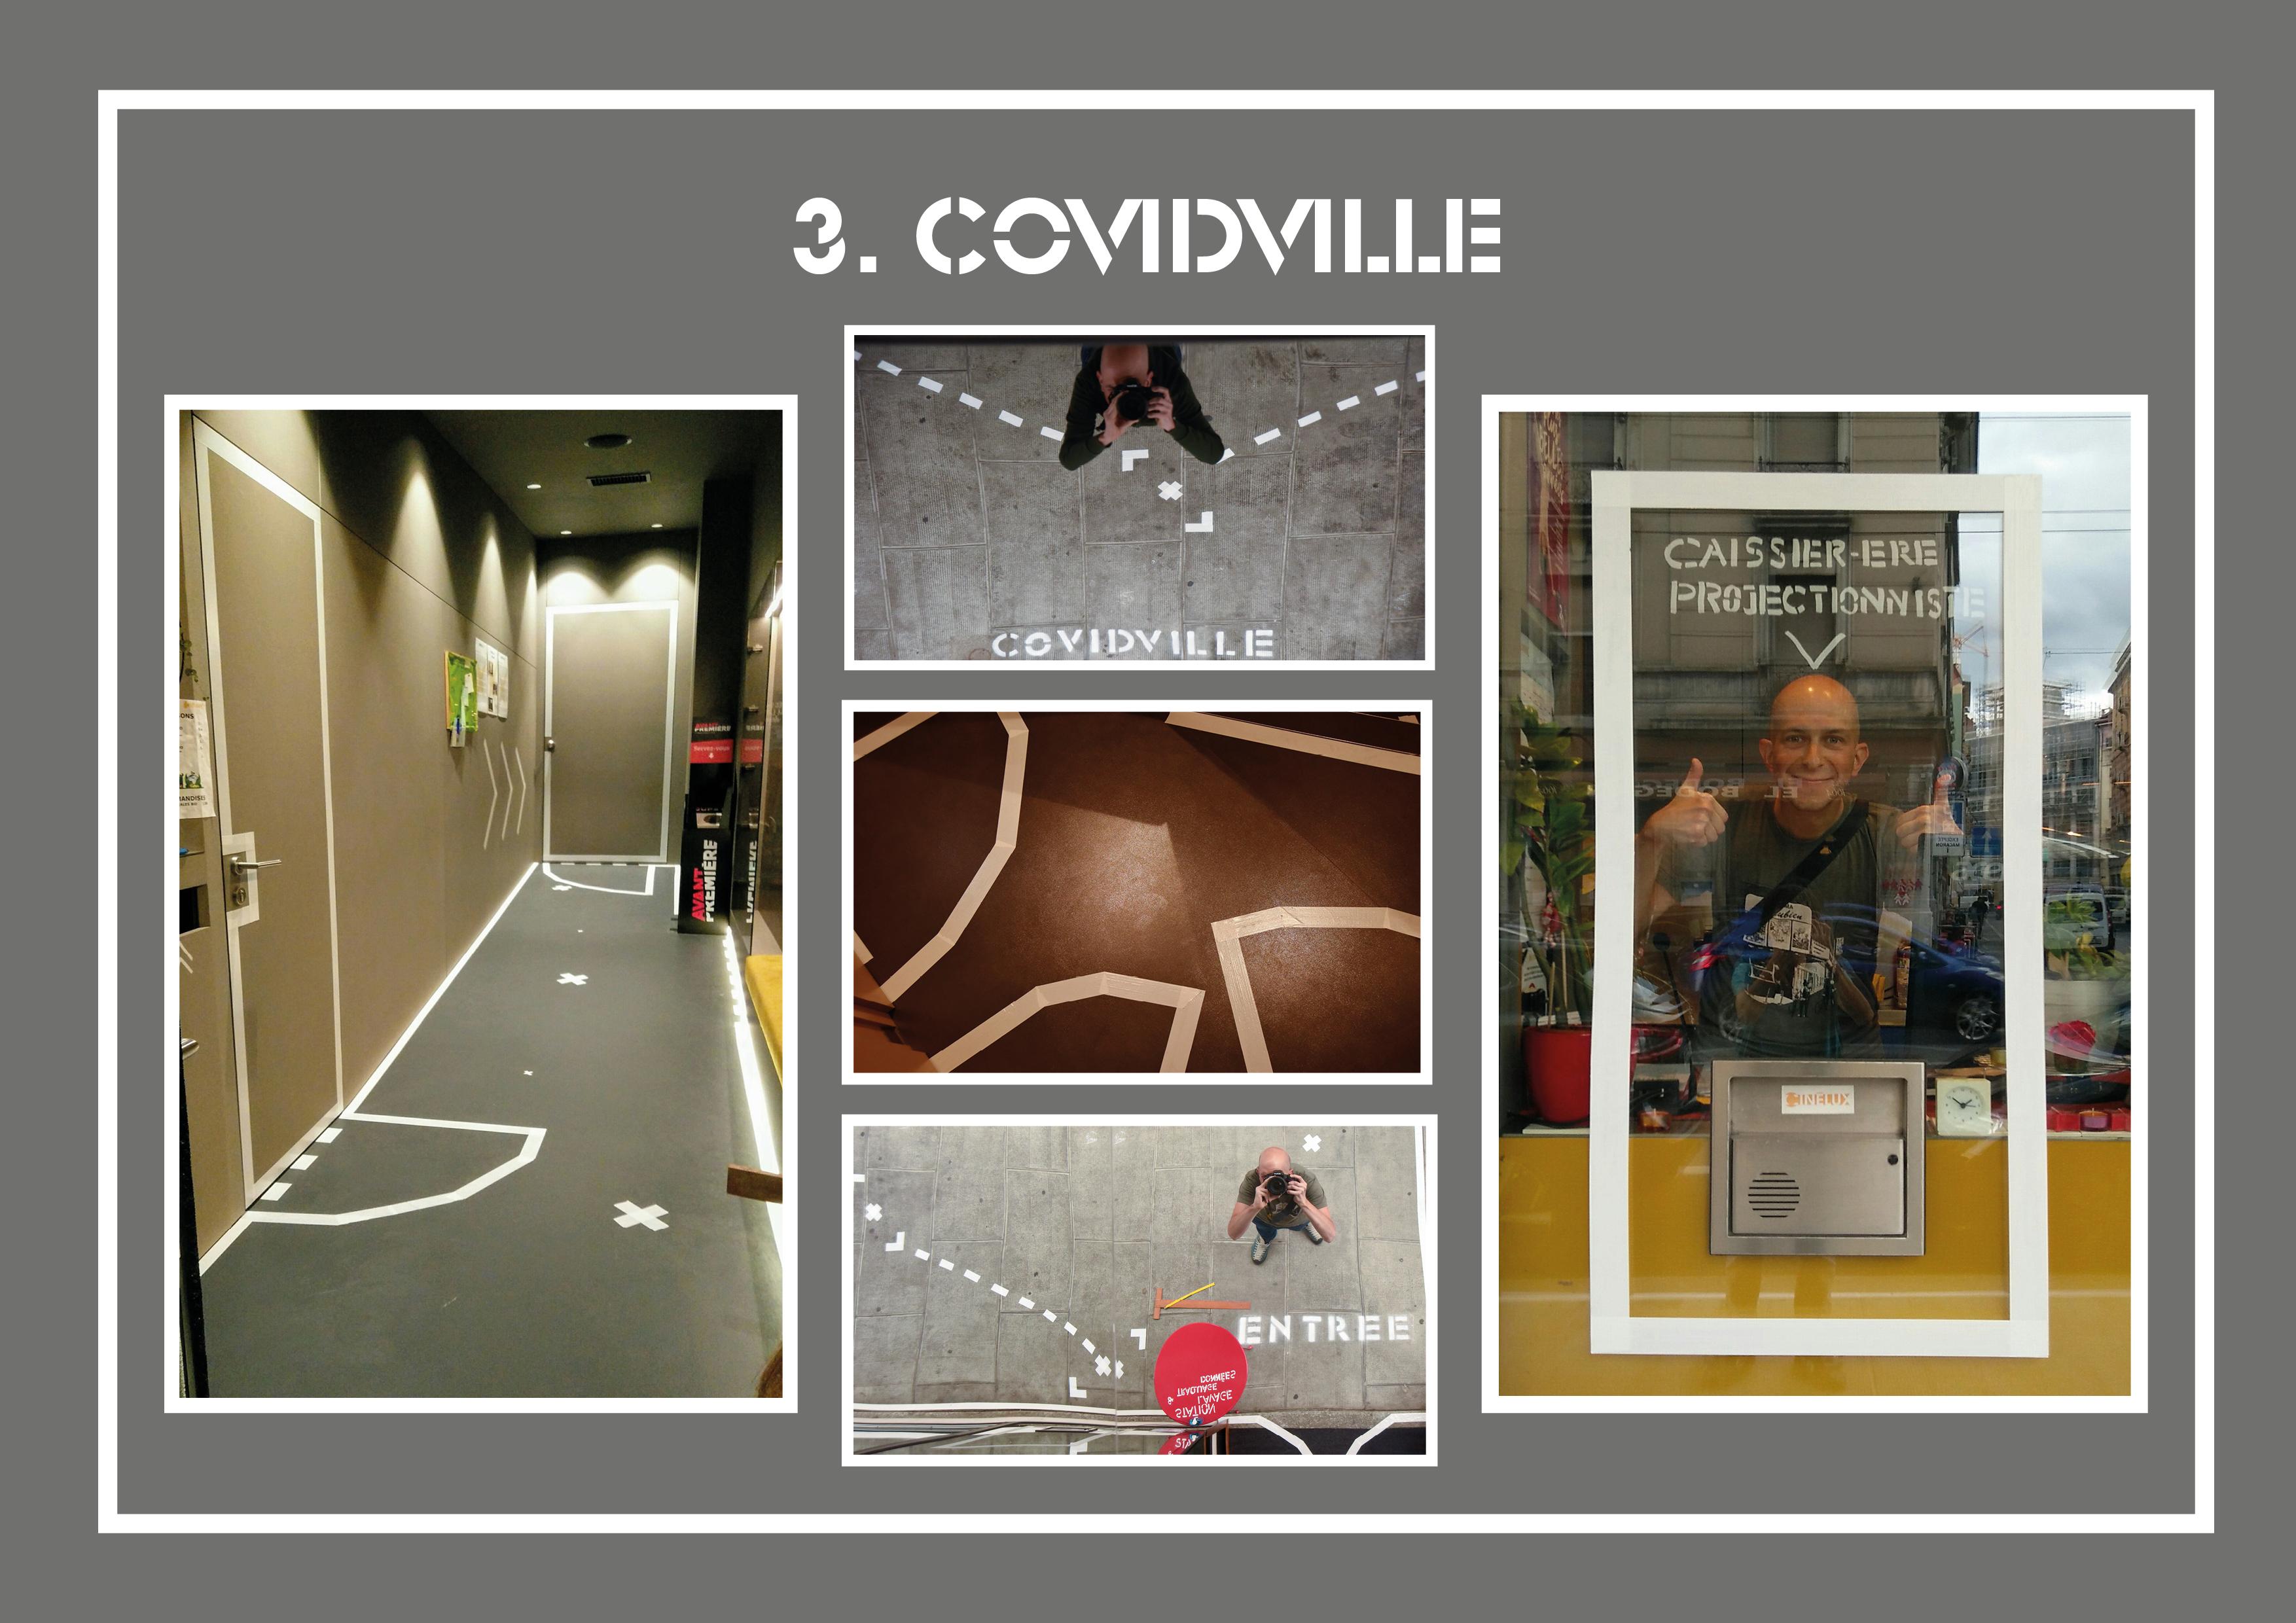 CovidvilleDossier6